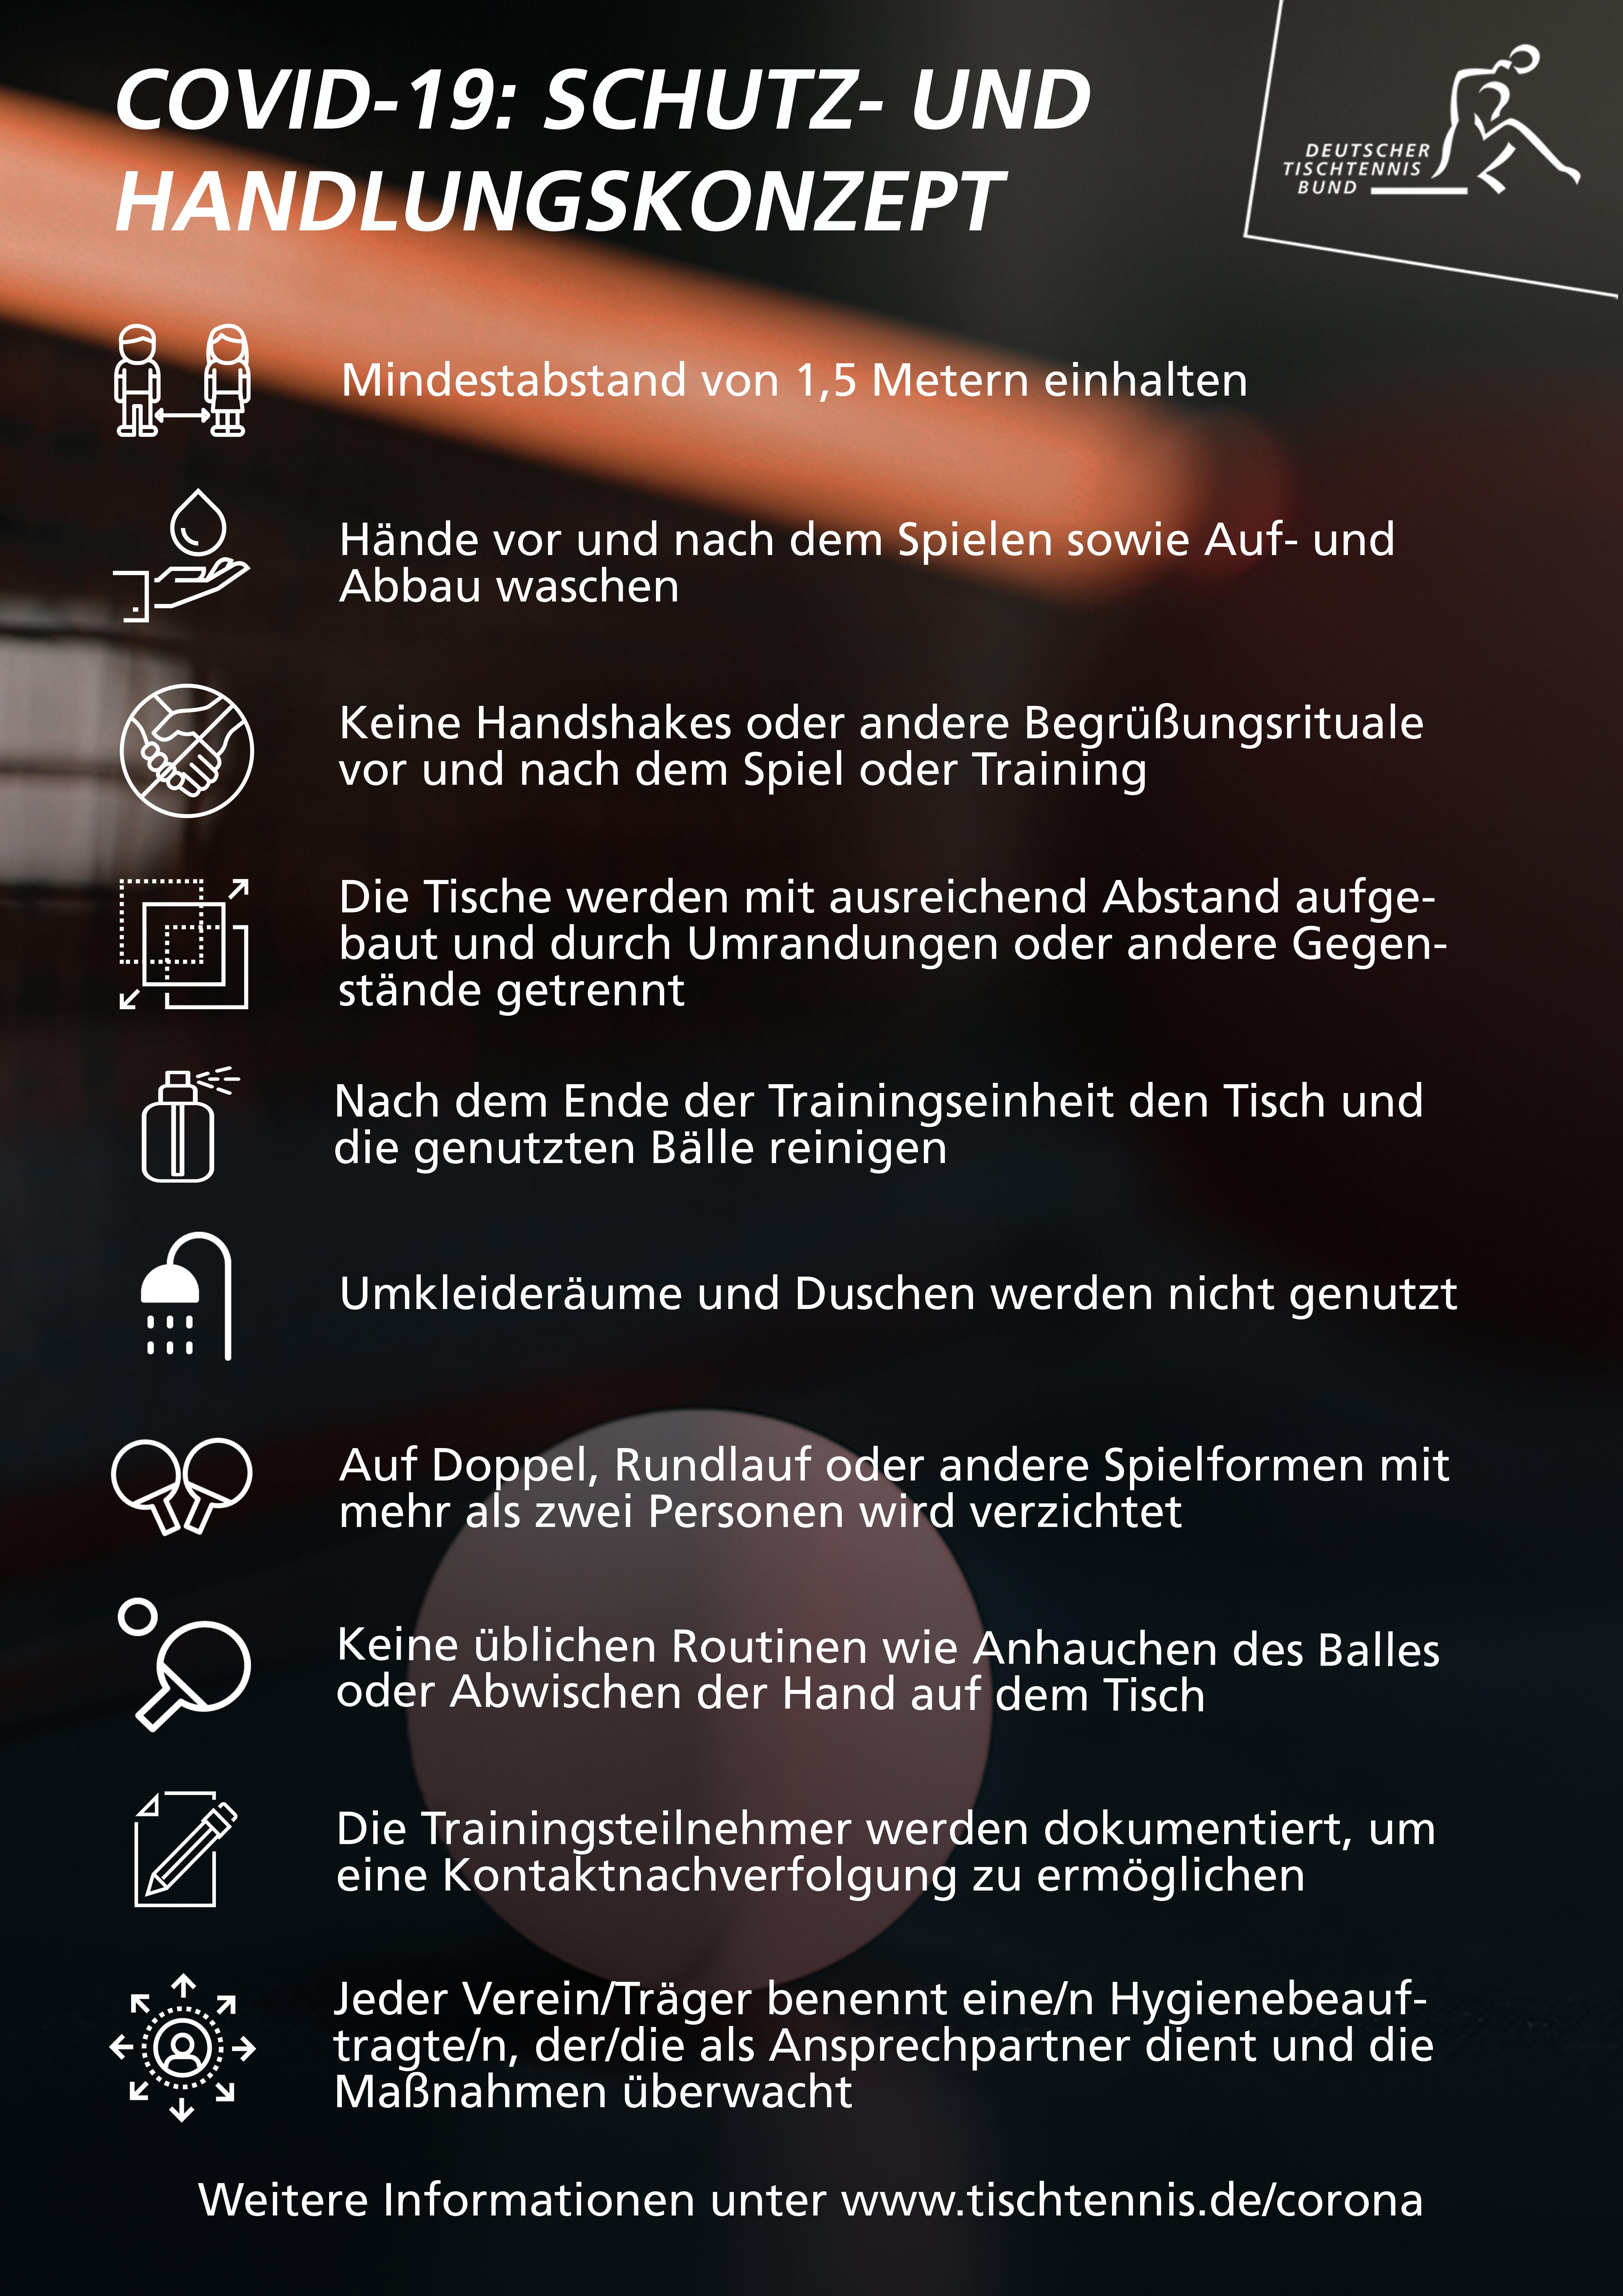 https://www.tischtennis.de/fileadmin/images_articles/06_Sonstiges/Corona/Hygiene_Guidelines_final2.jpg